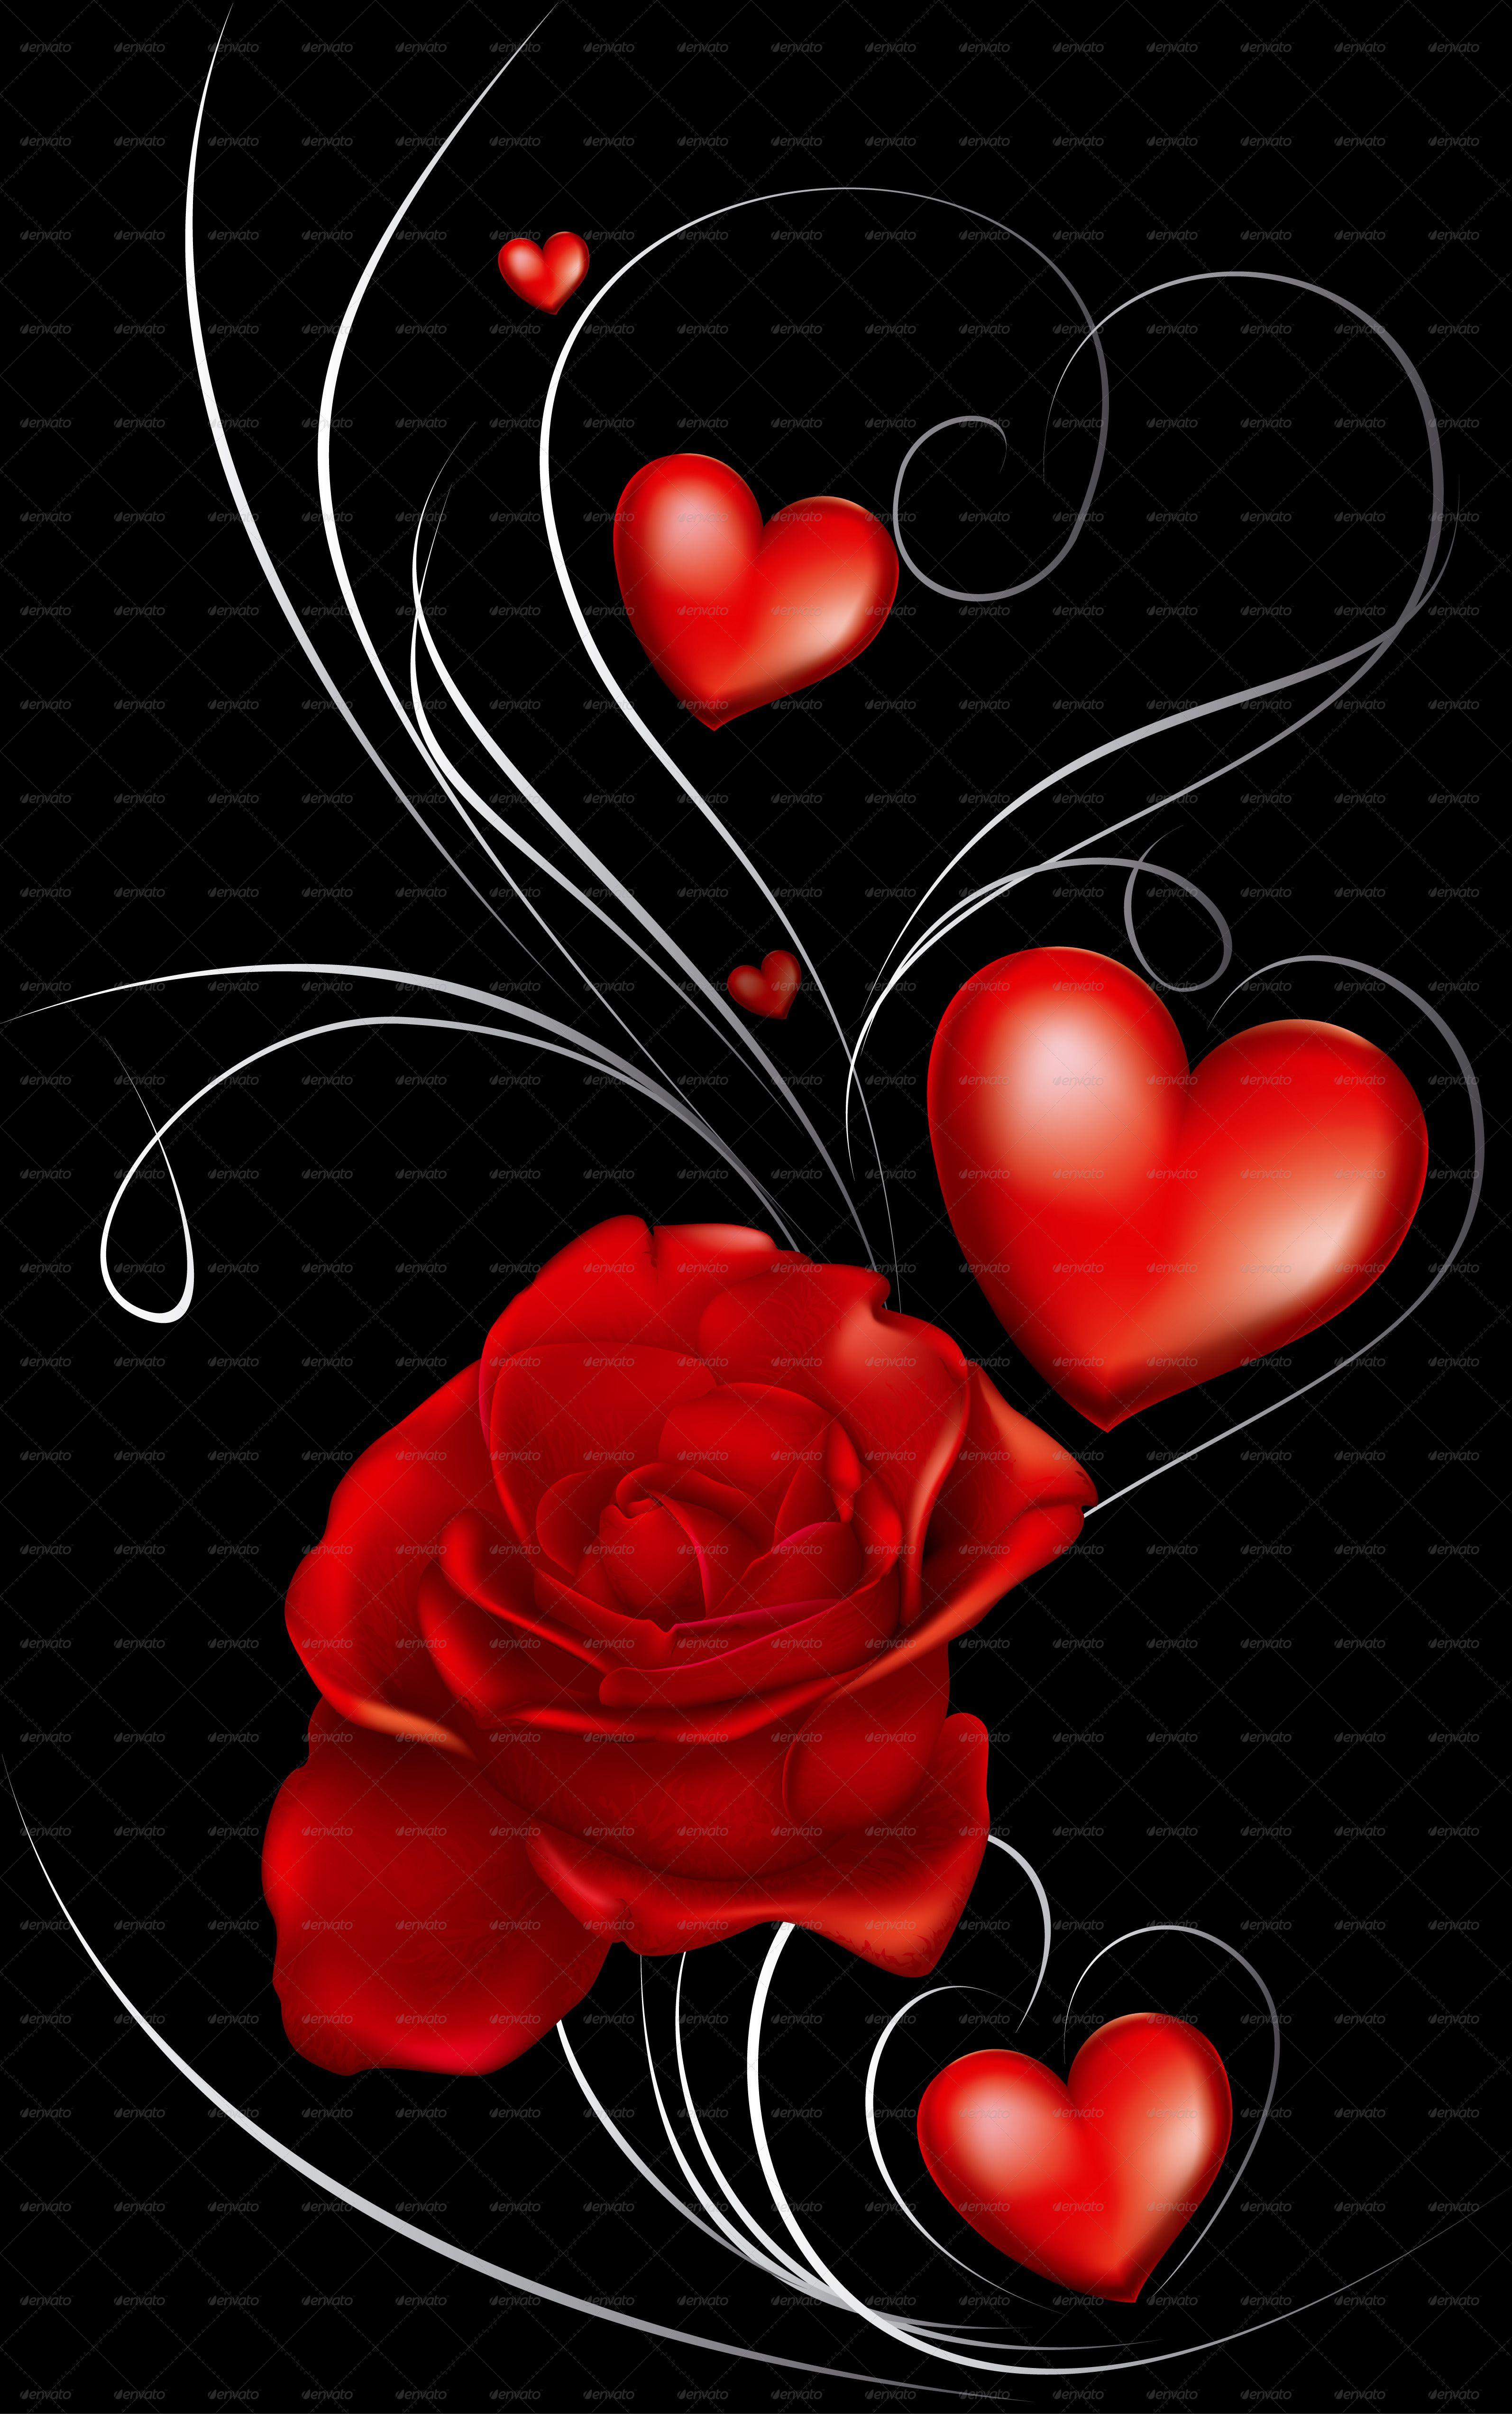 Dark Red Roses And Heart Dark Red Roses Red Roses Heart Wallpaper